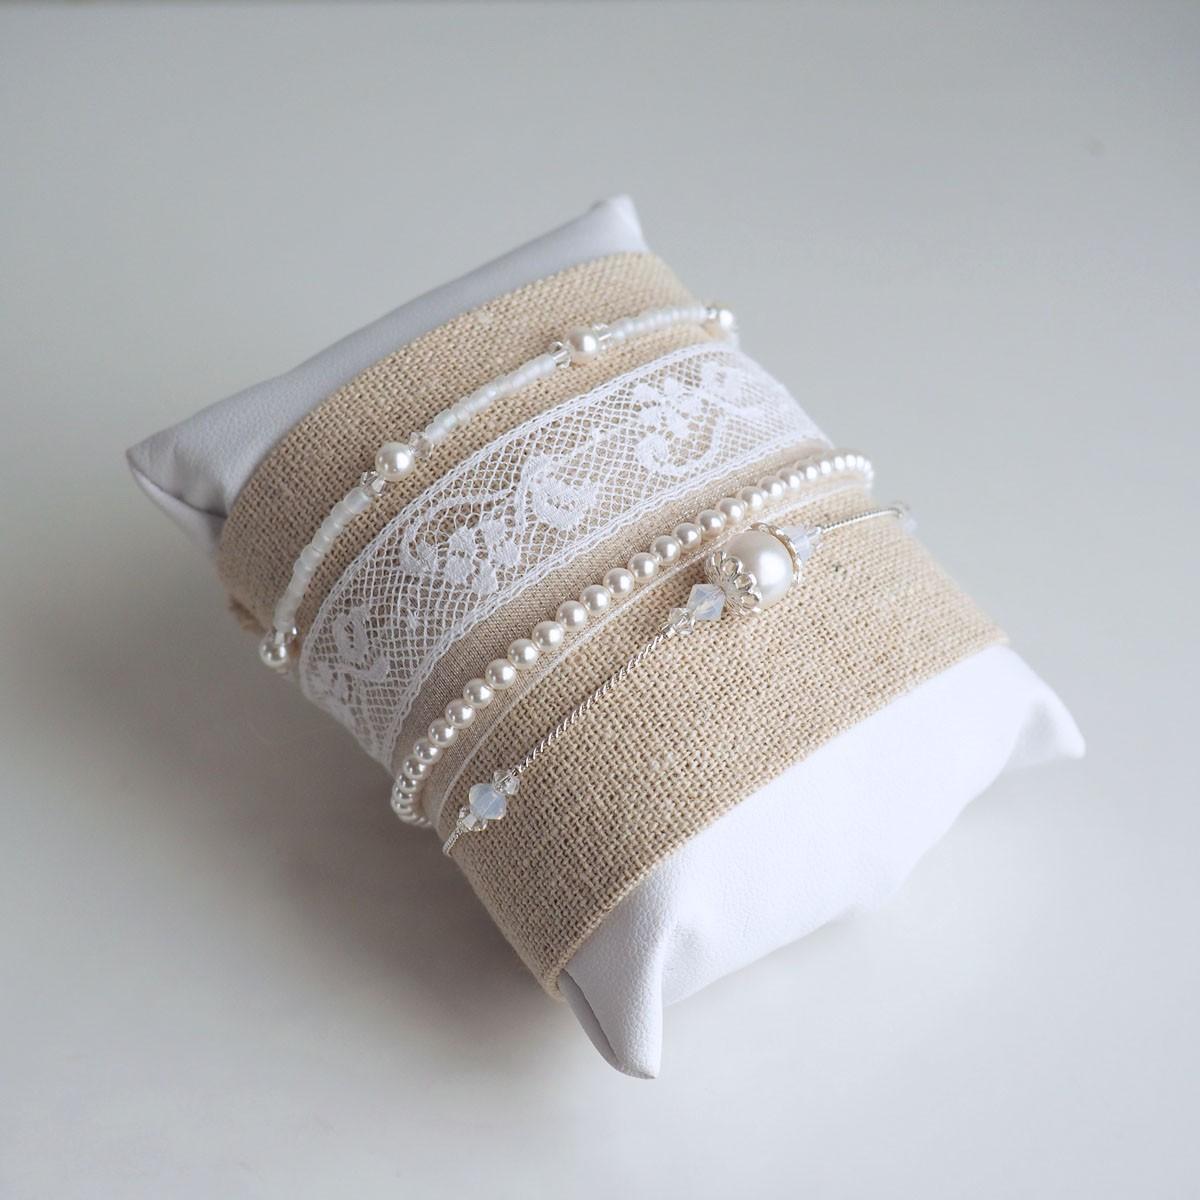 Perle Bracelet Mariée Swarovski Swarovski Perle Mariée Mariée Bracelet Swarovski Perle Bracelet On08wPk